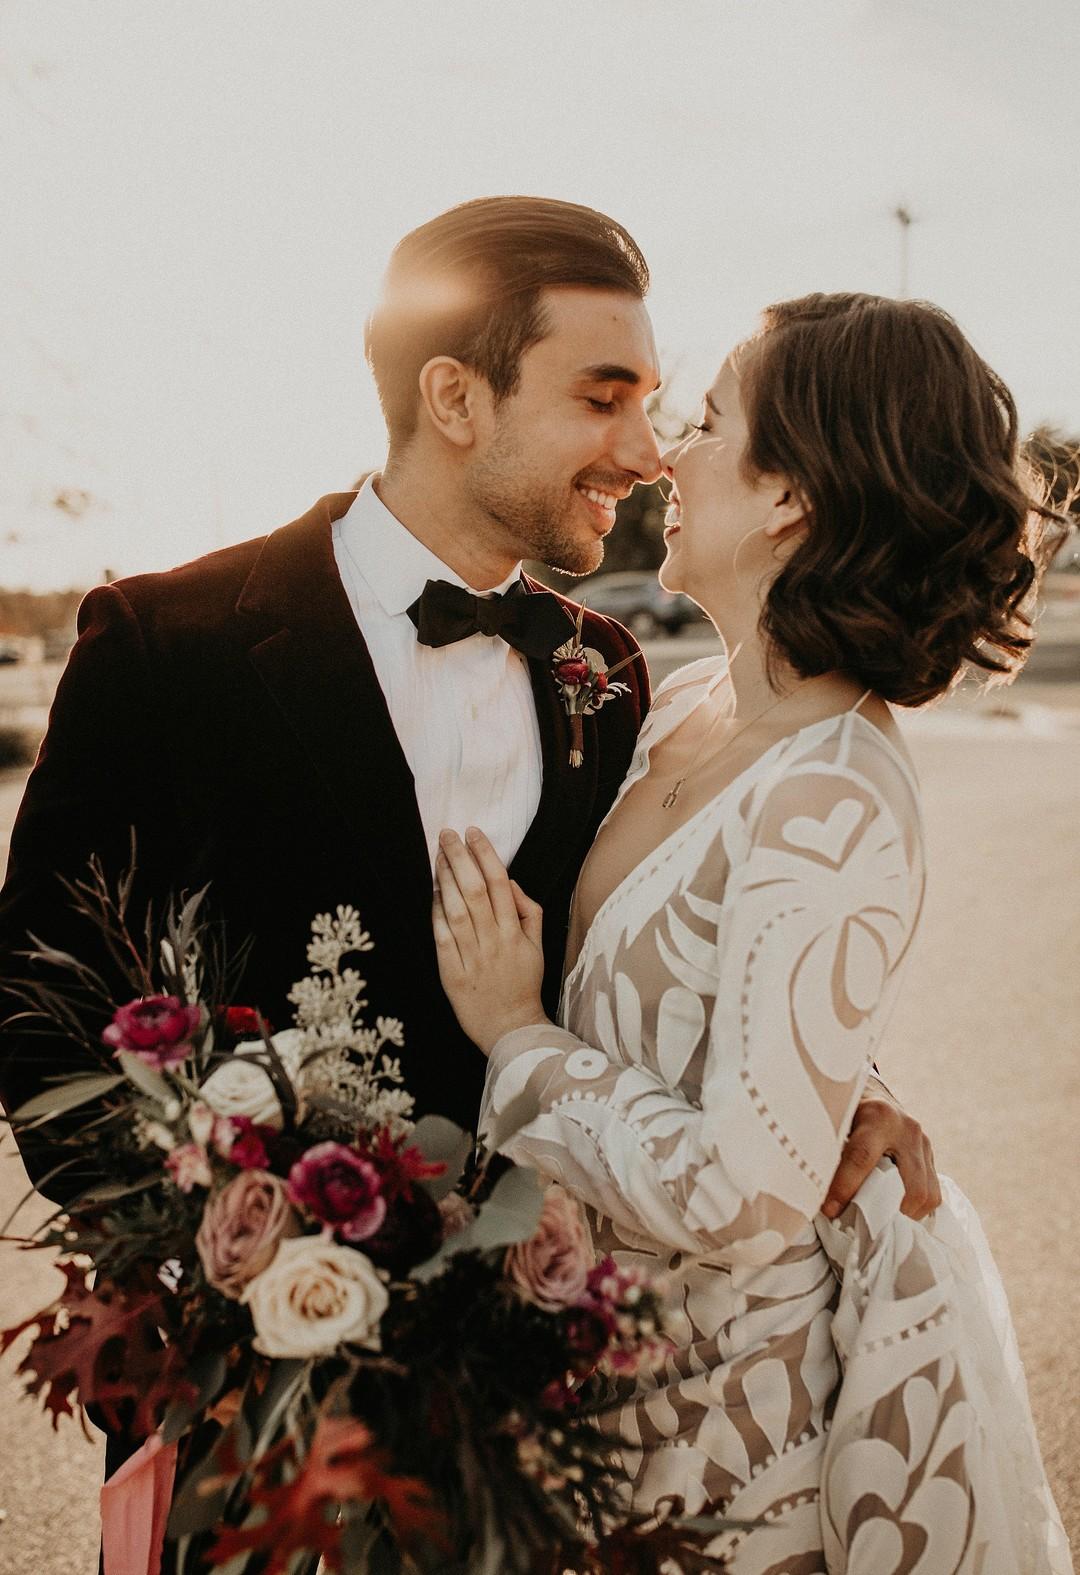 bröllop+boho+inspiration+bröllopsblogg